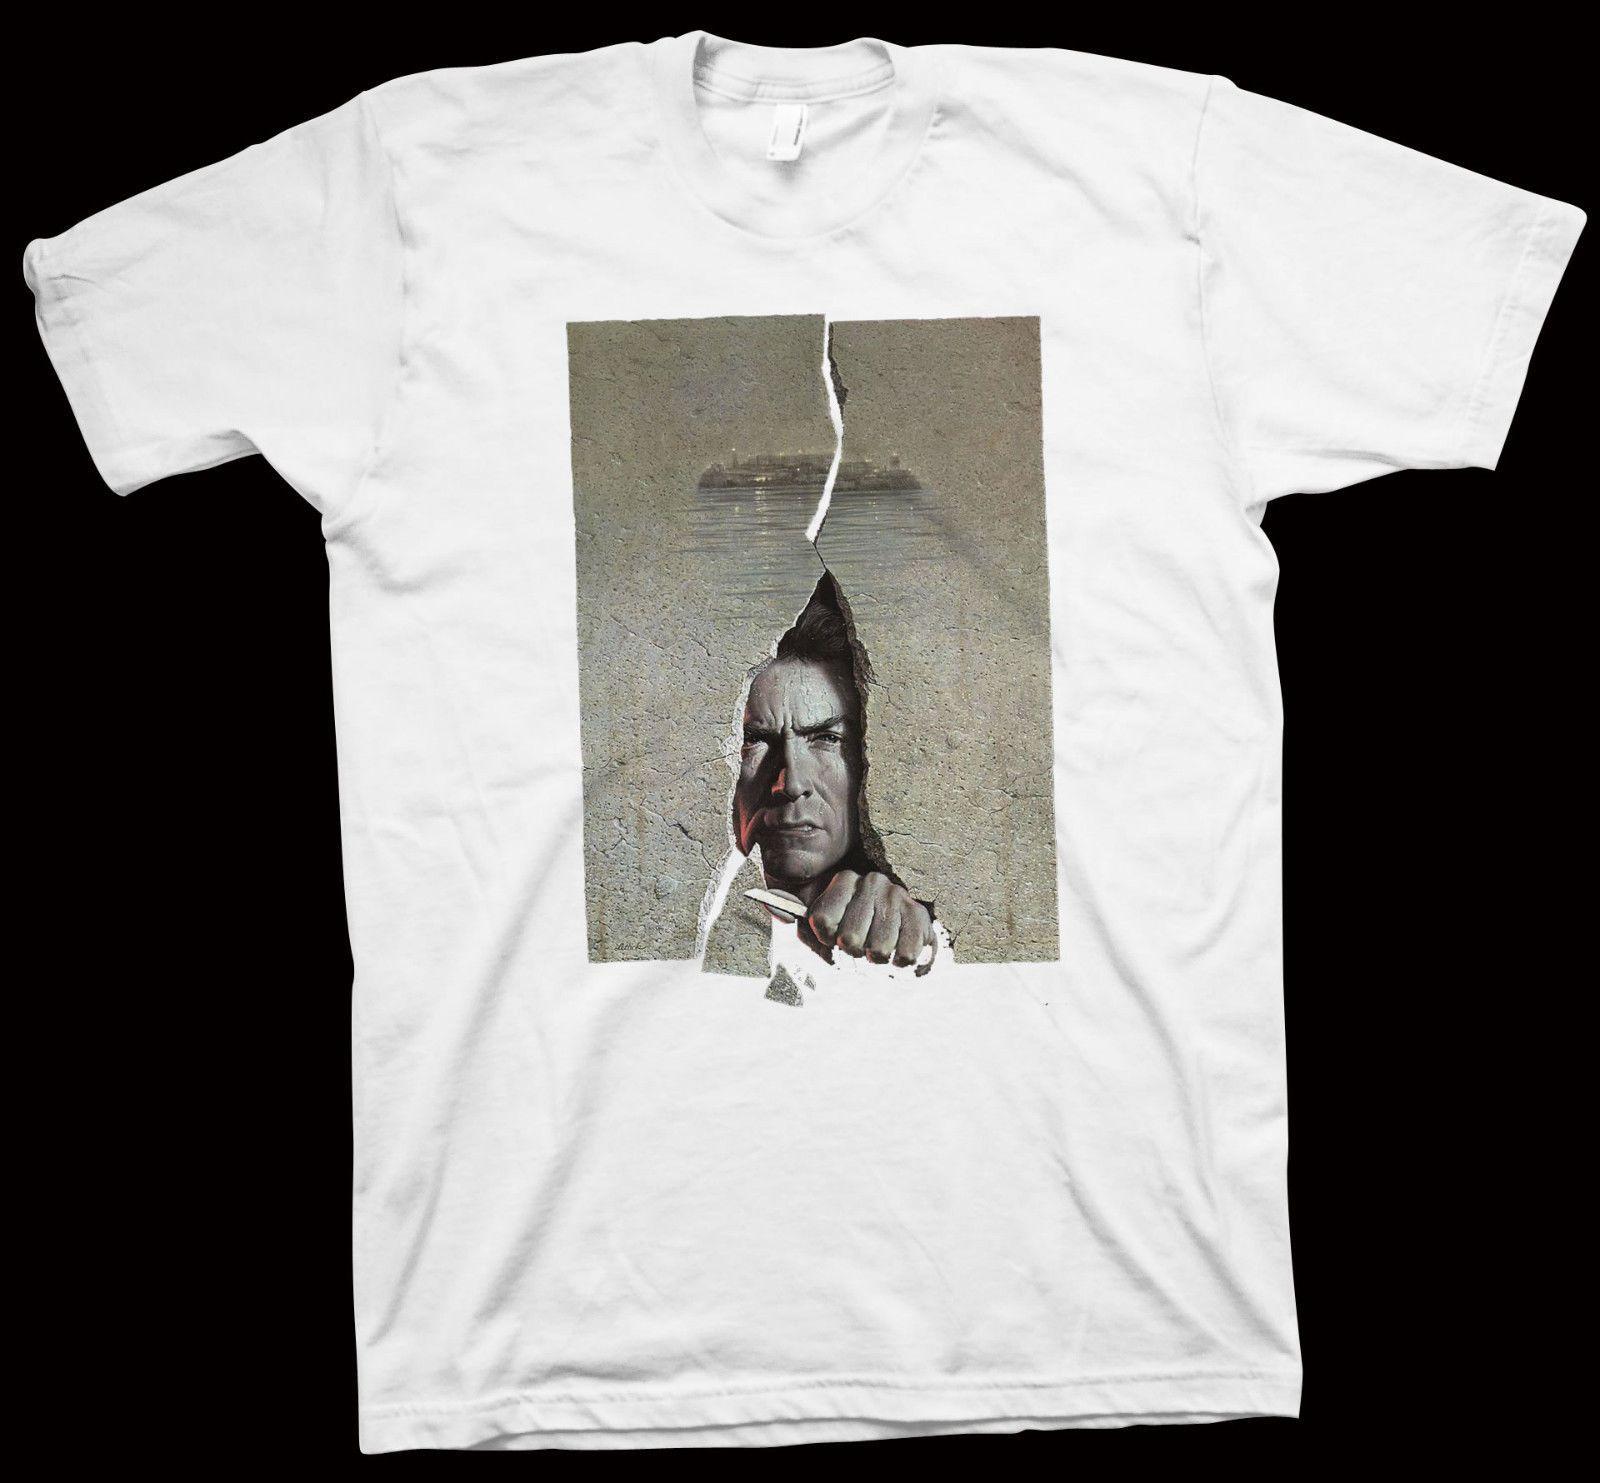 Details About Escape From Alcatraz T Shirt Don Siegel Clint